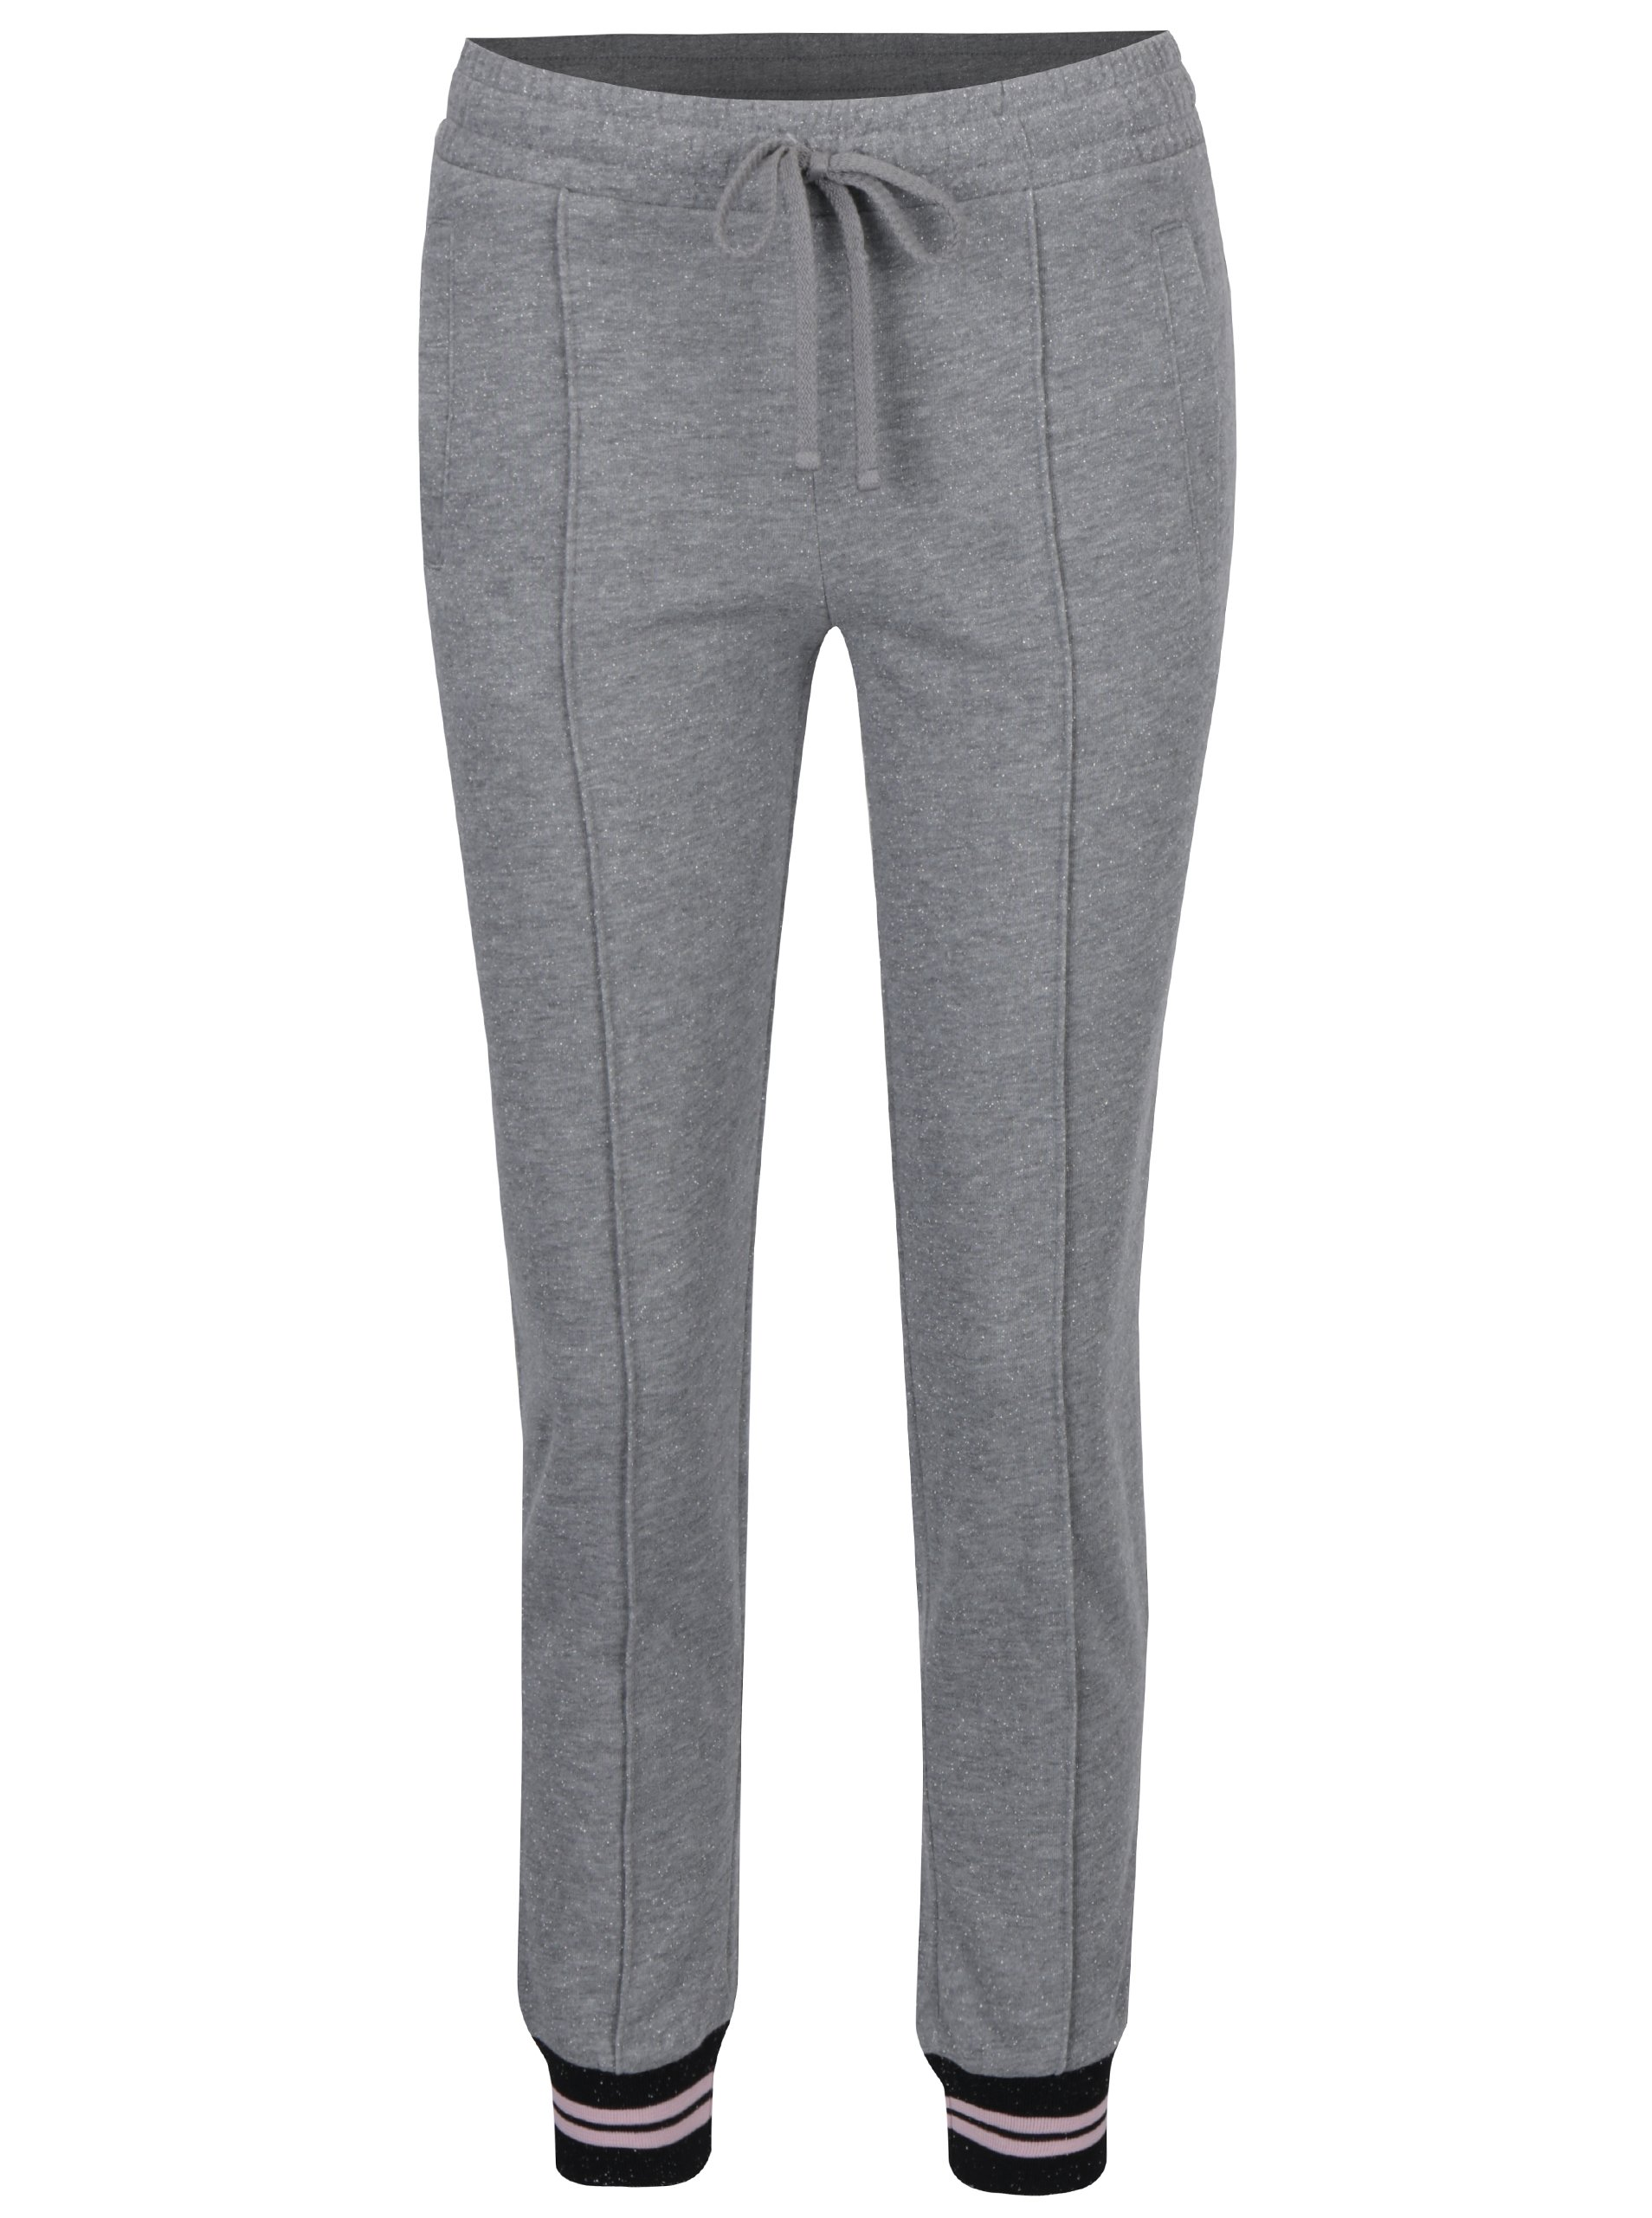 Sivé tepláky Juicy Couture